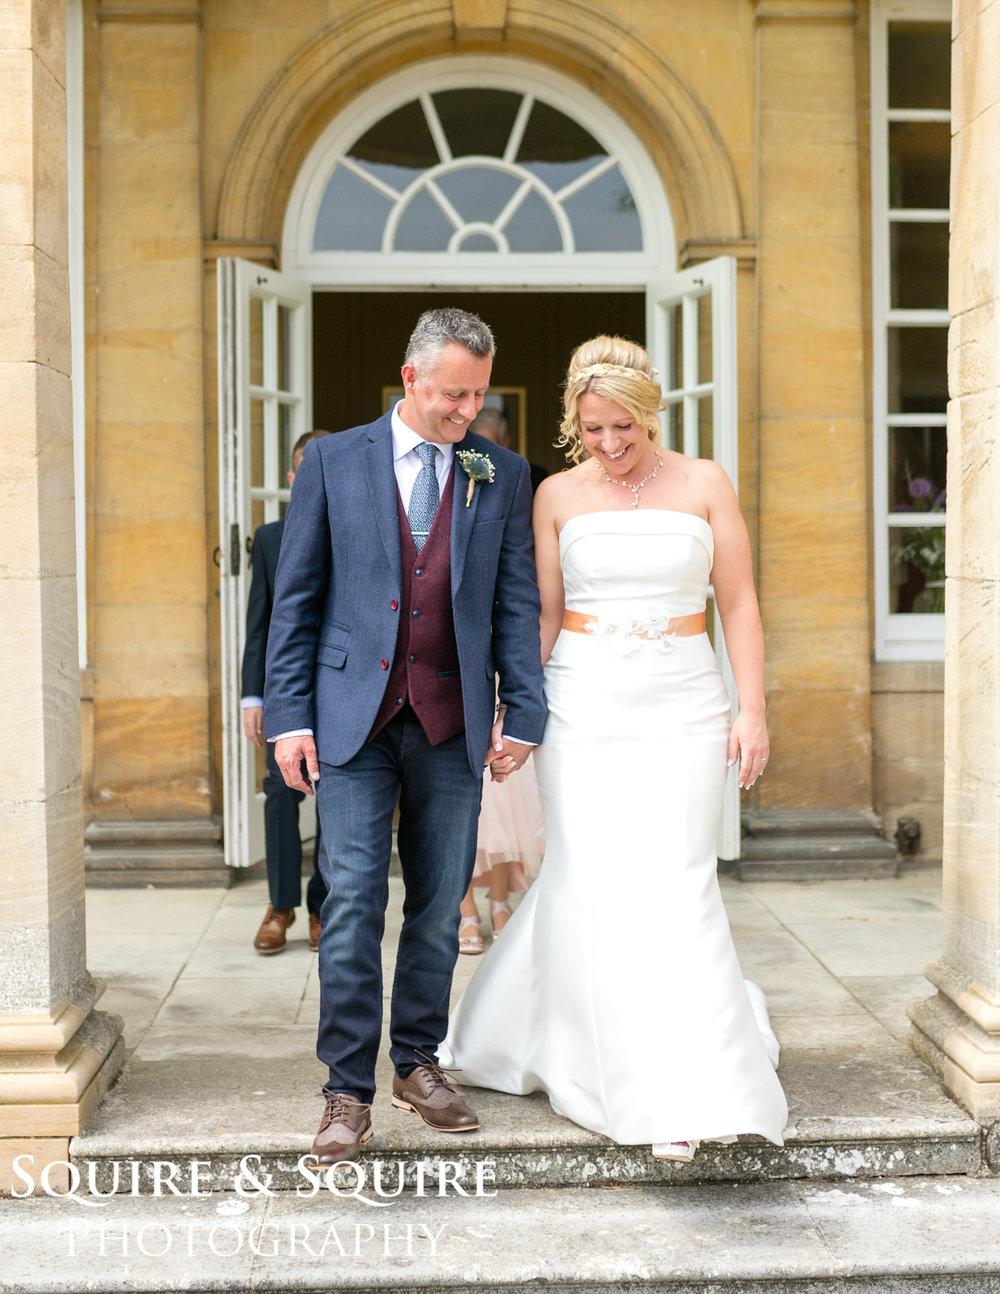 wedding_photography_catthorpe Manor (43 of 66).jpg